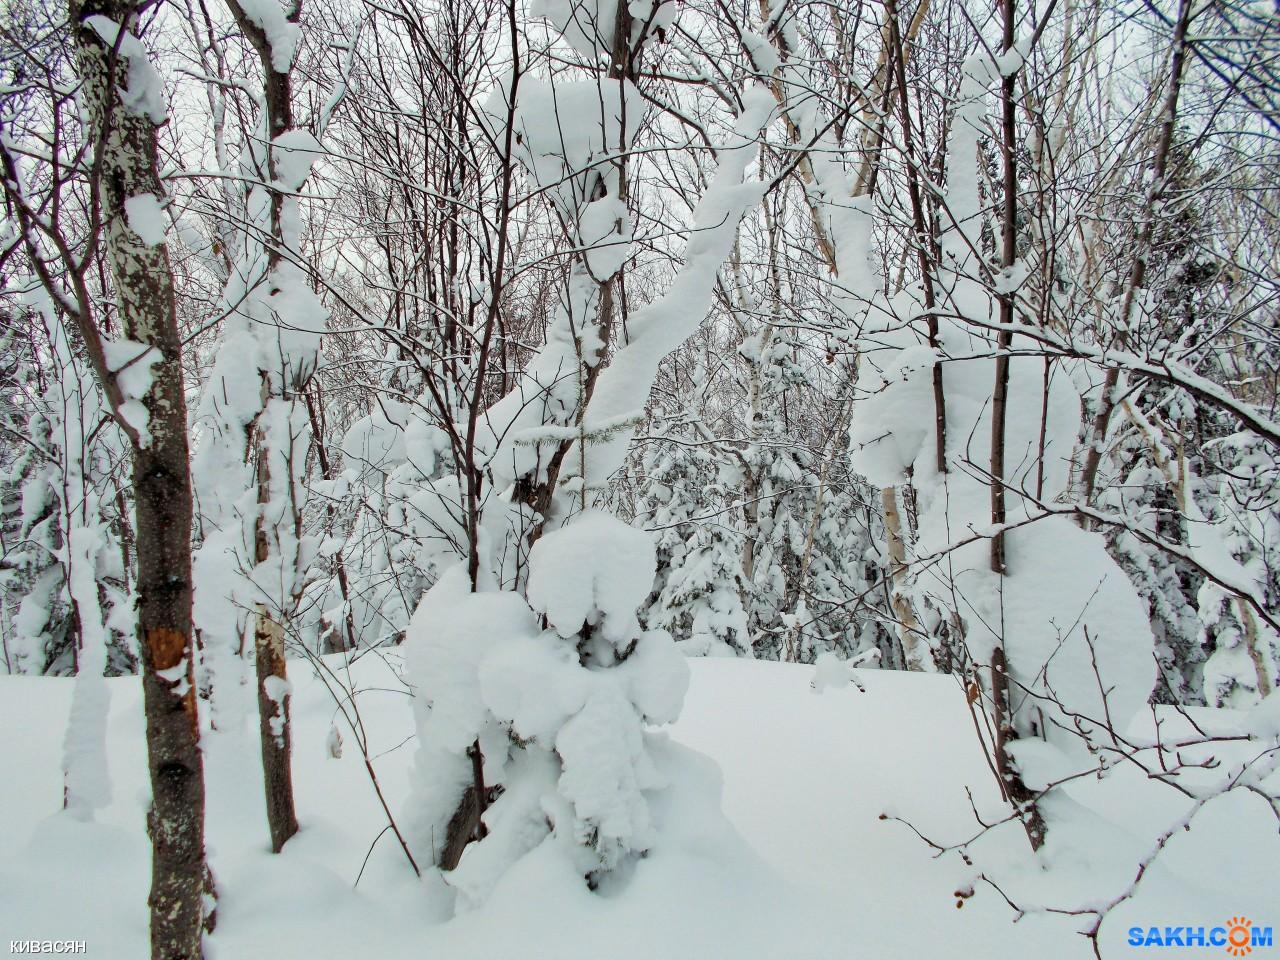 кивасян: DSCN0036